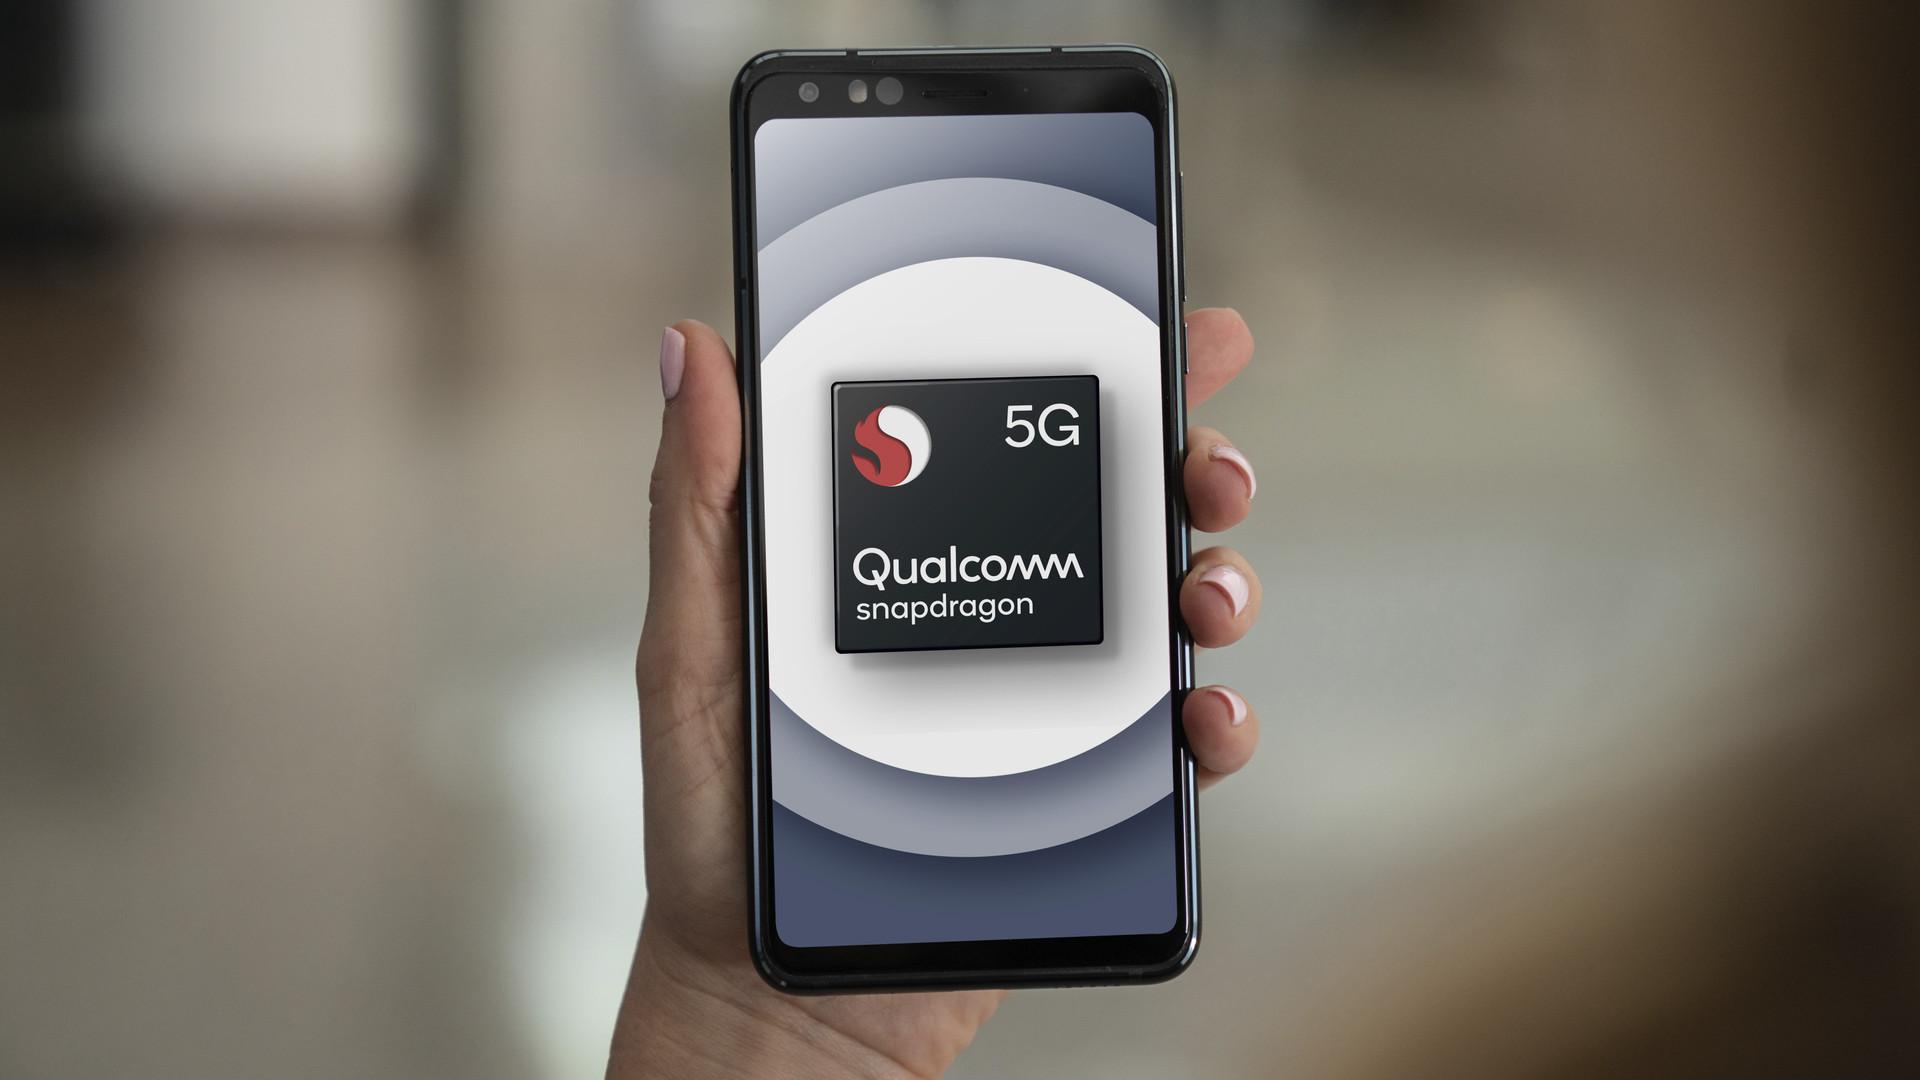 Qualcomm Snapdragon 400 5G